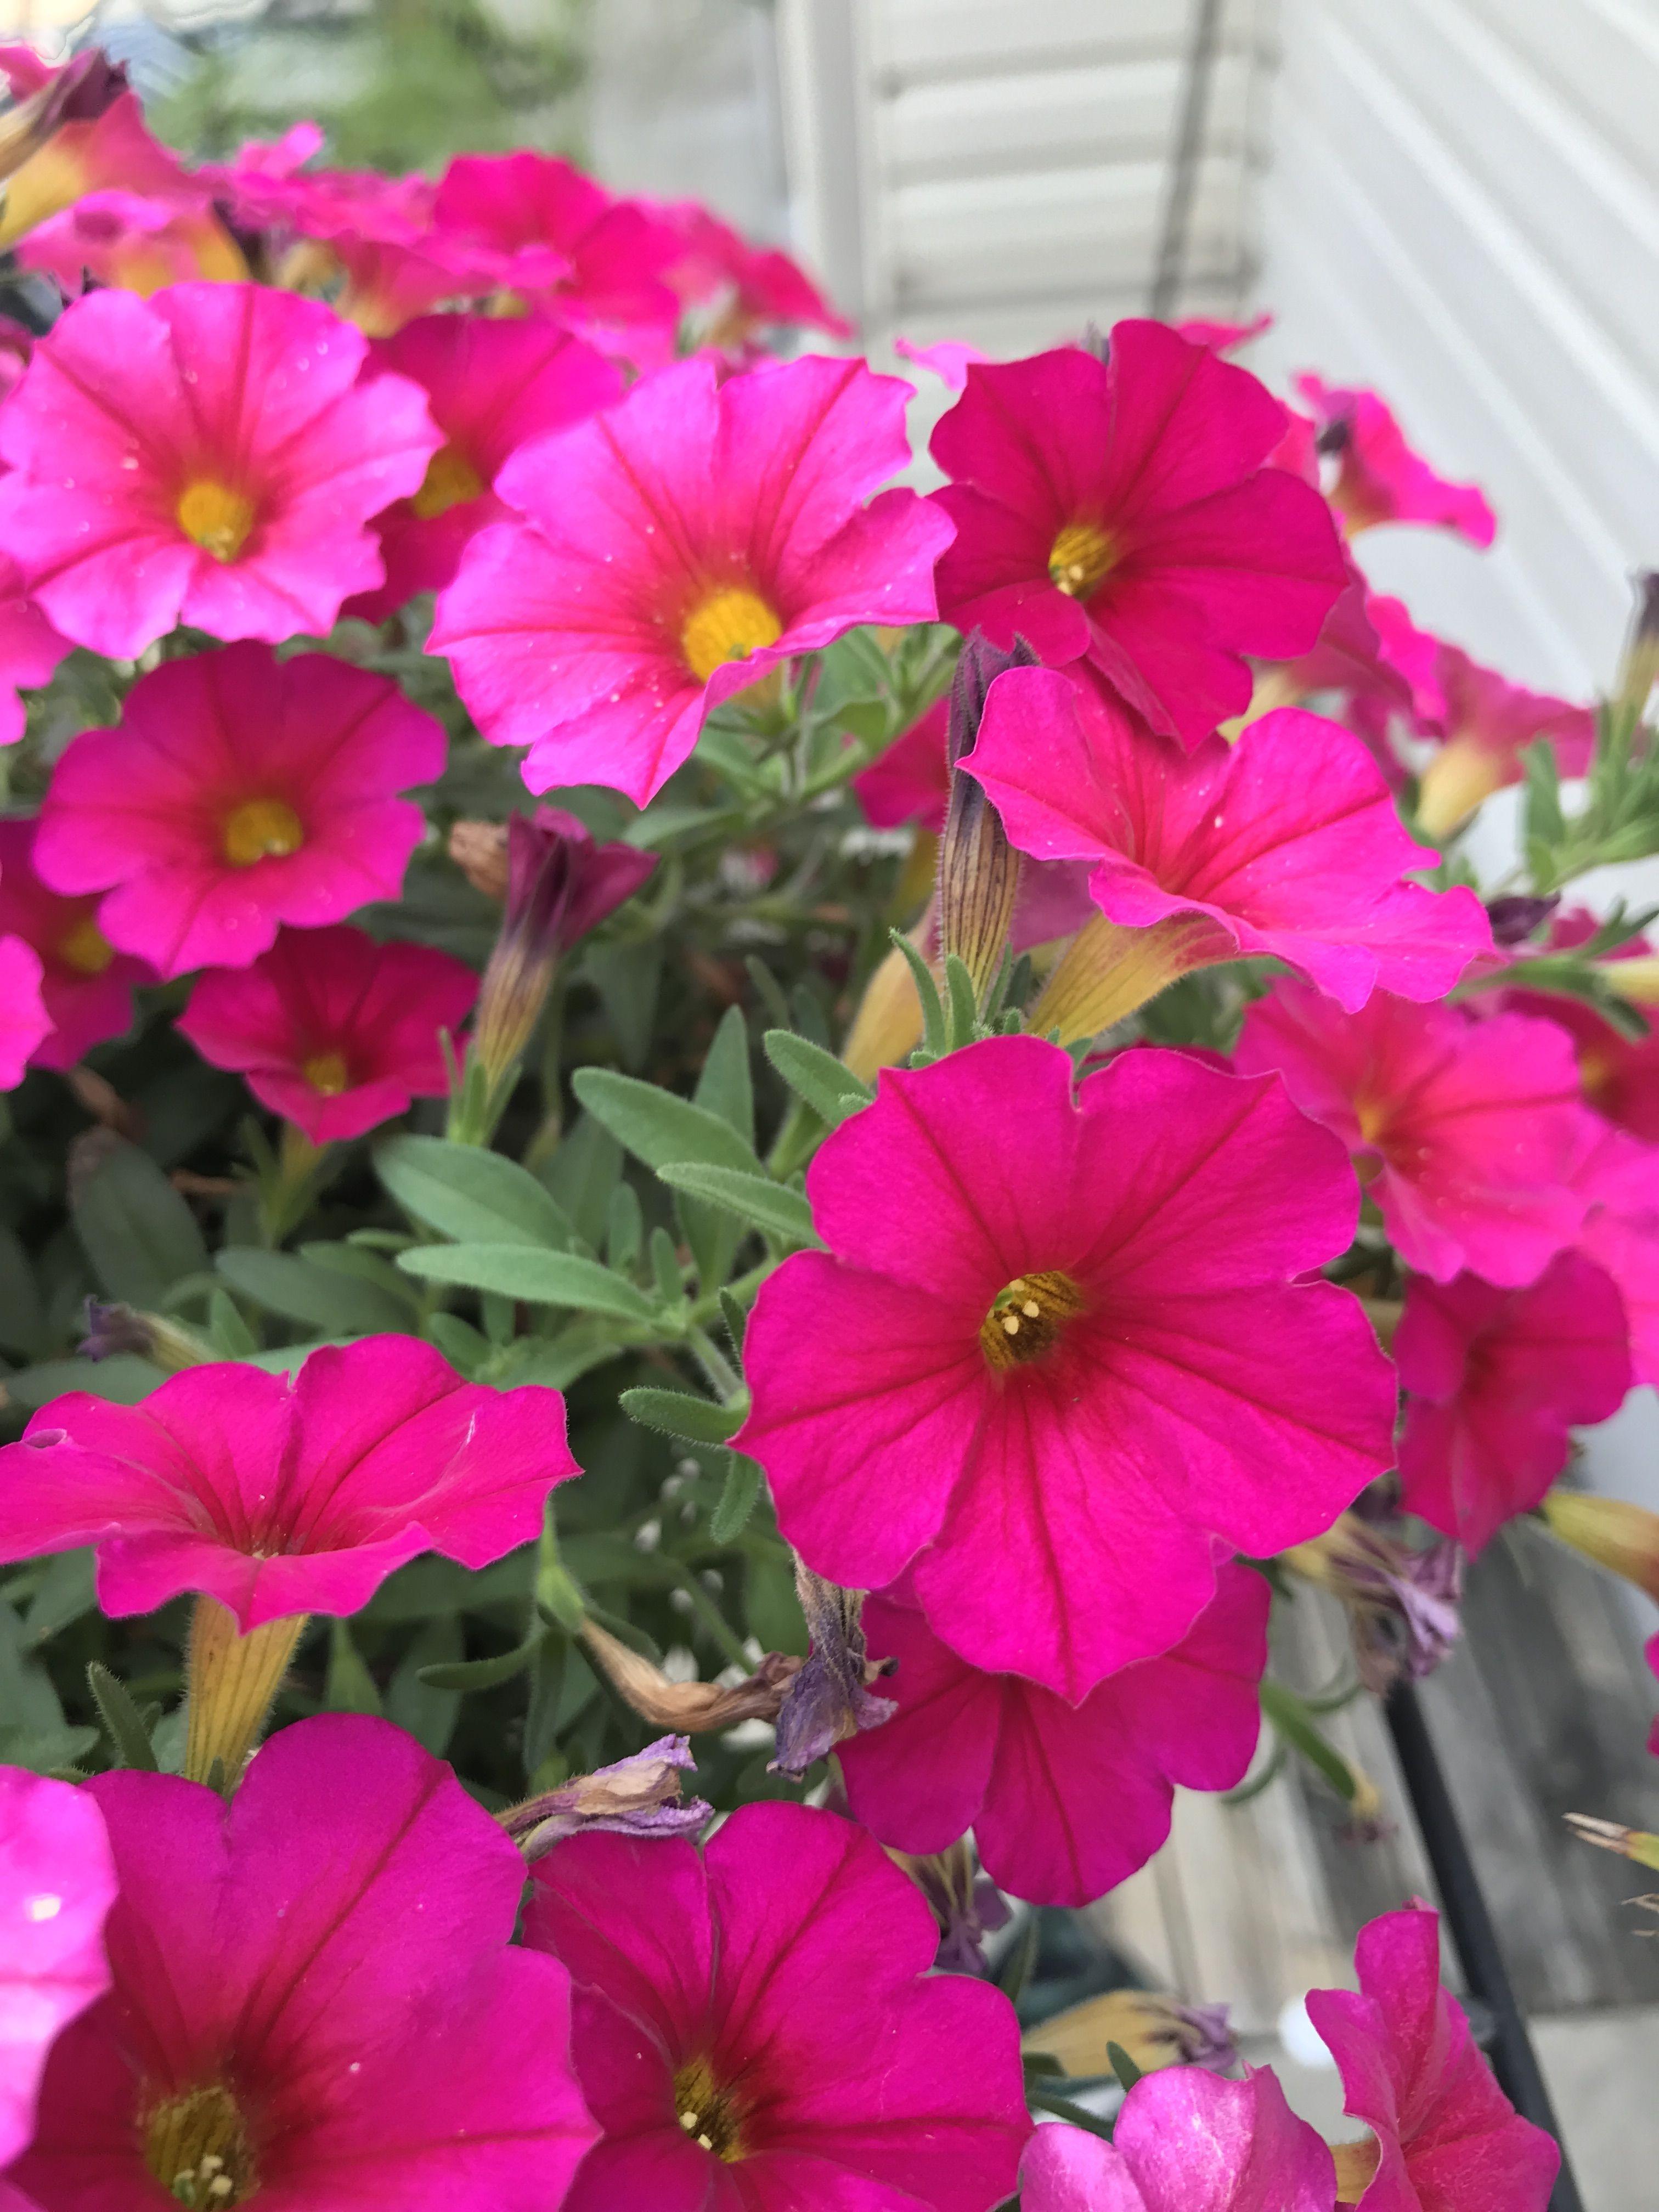 Kabloom Deep Pink Calibrachoa Full Sun Annuals Easy Care No Deadheading Needed Keep Soil Moist Landscaping Retaining Walls My Flower Bloom